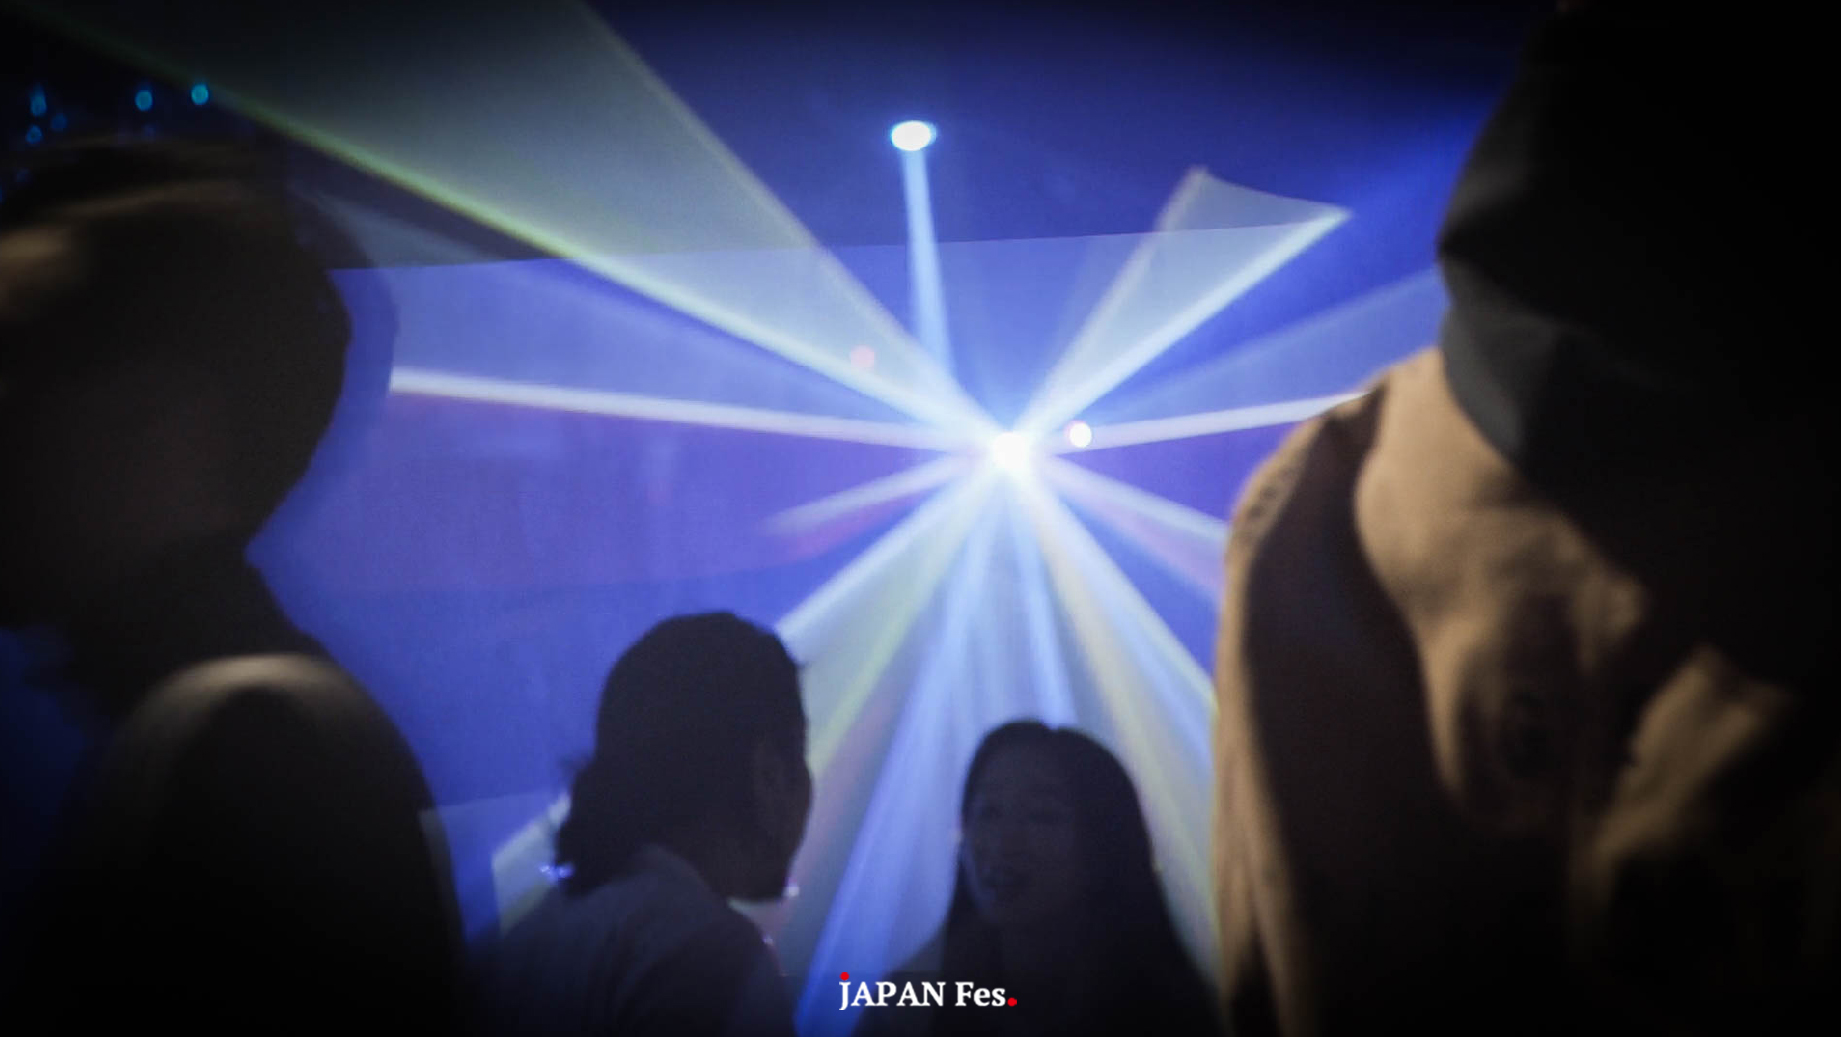 JAPAN Fes 2.jpg